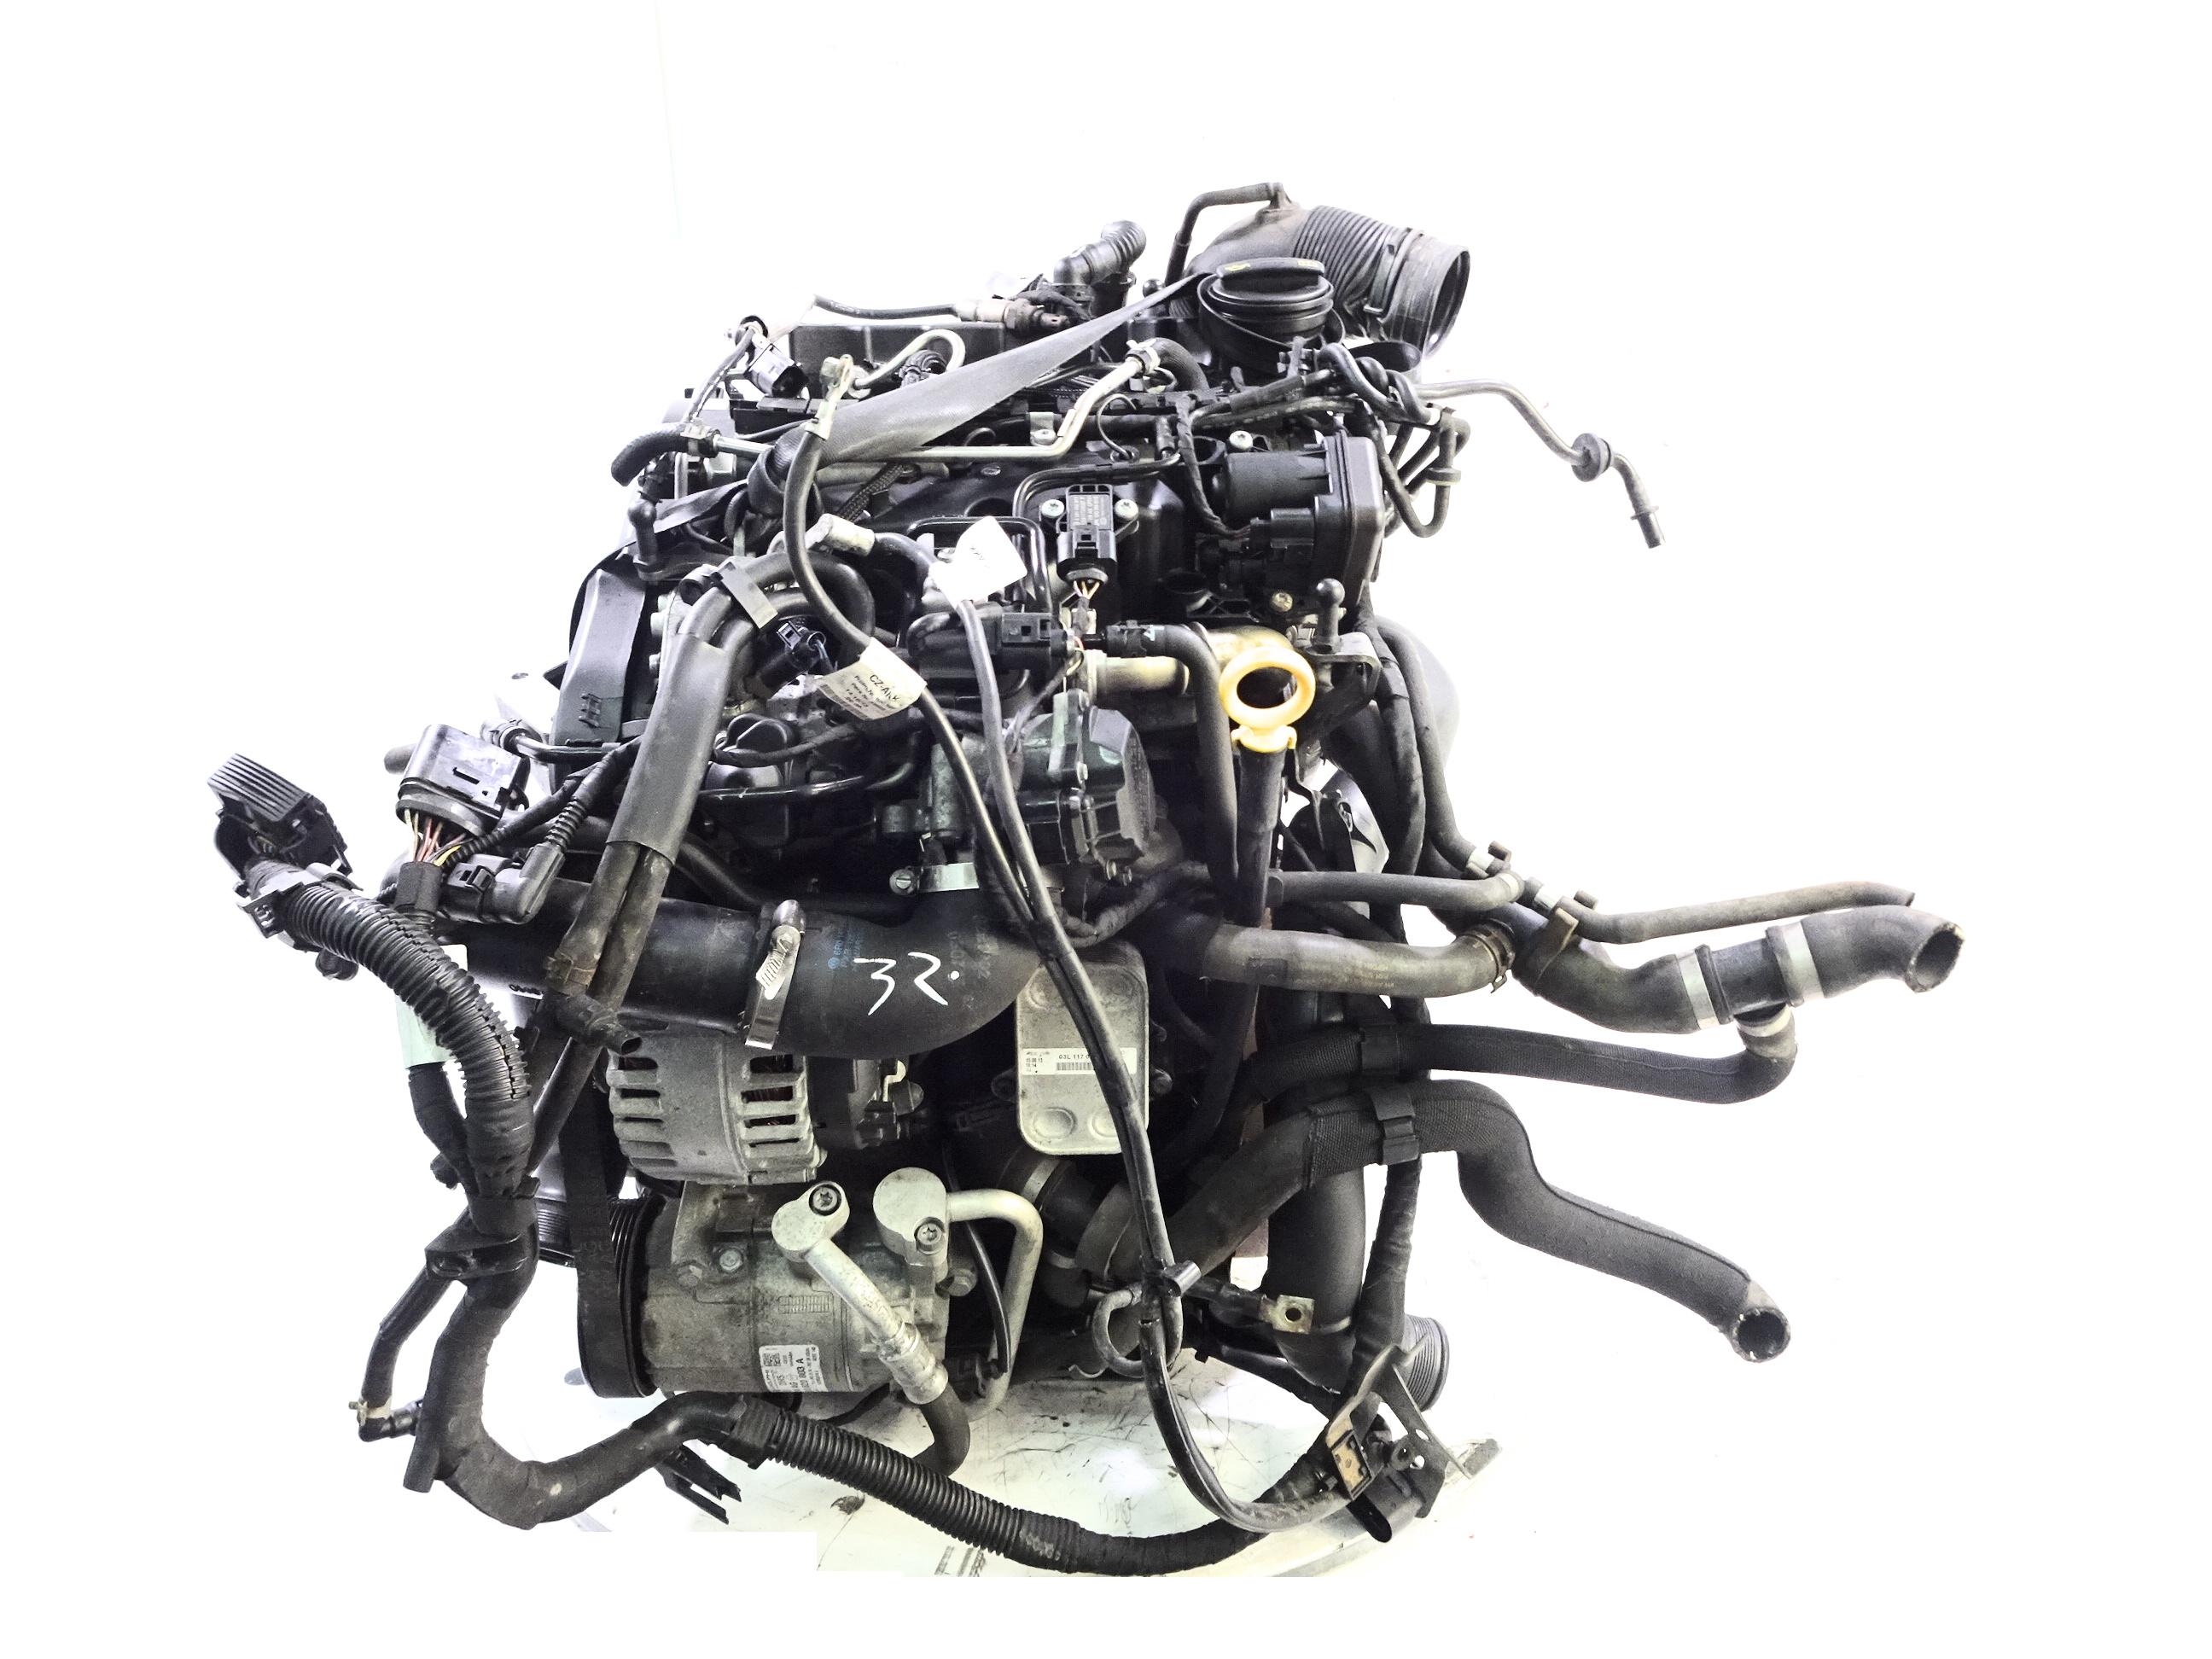 Motor 2014 Seat Skoda VW Ibiza Fabia Polo 1,2 TDI CFW CFWA mit Anbauteilen